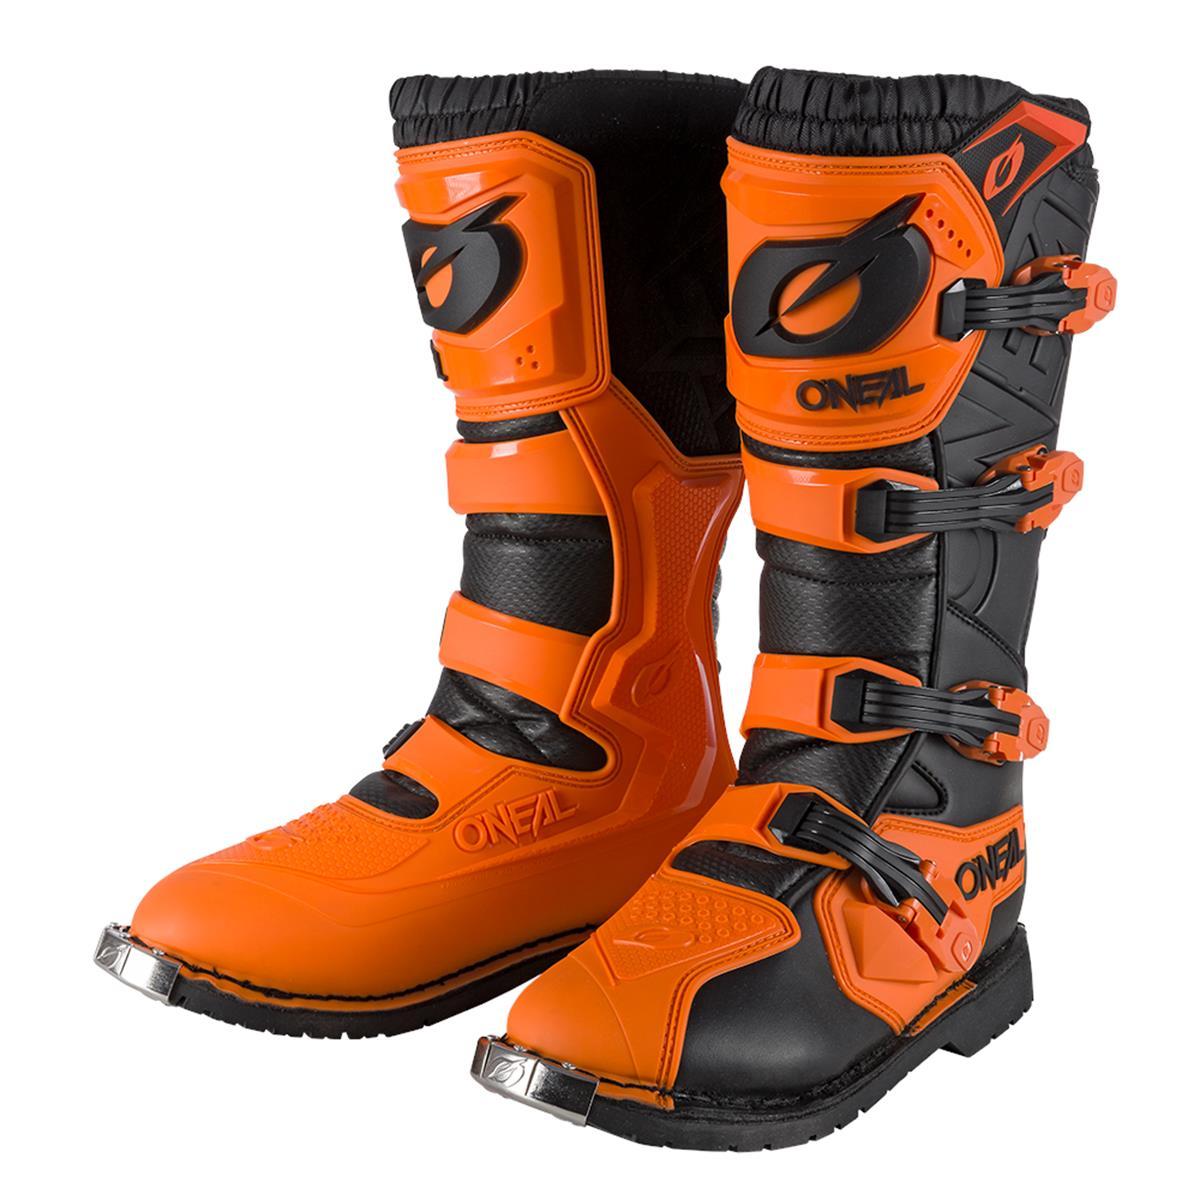 O'Neal MX Boots Rider Orange | Maciag